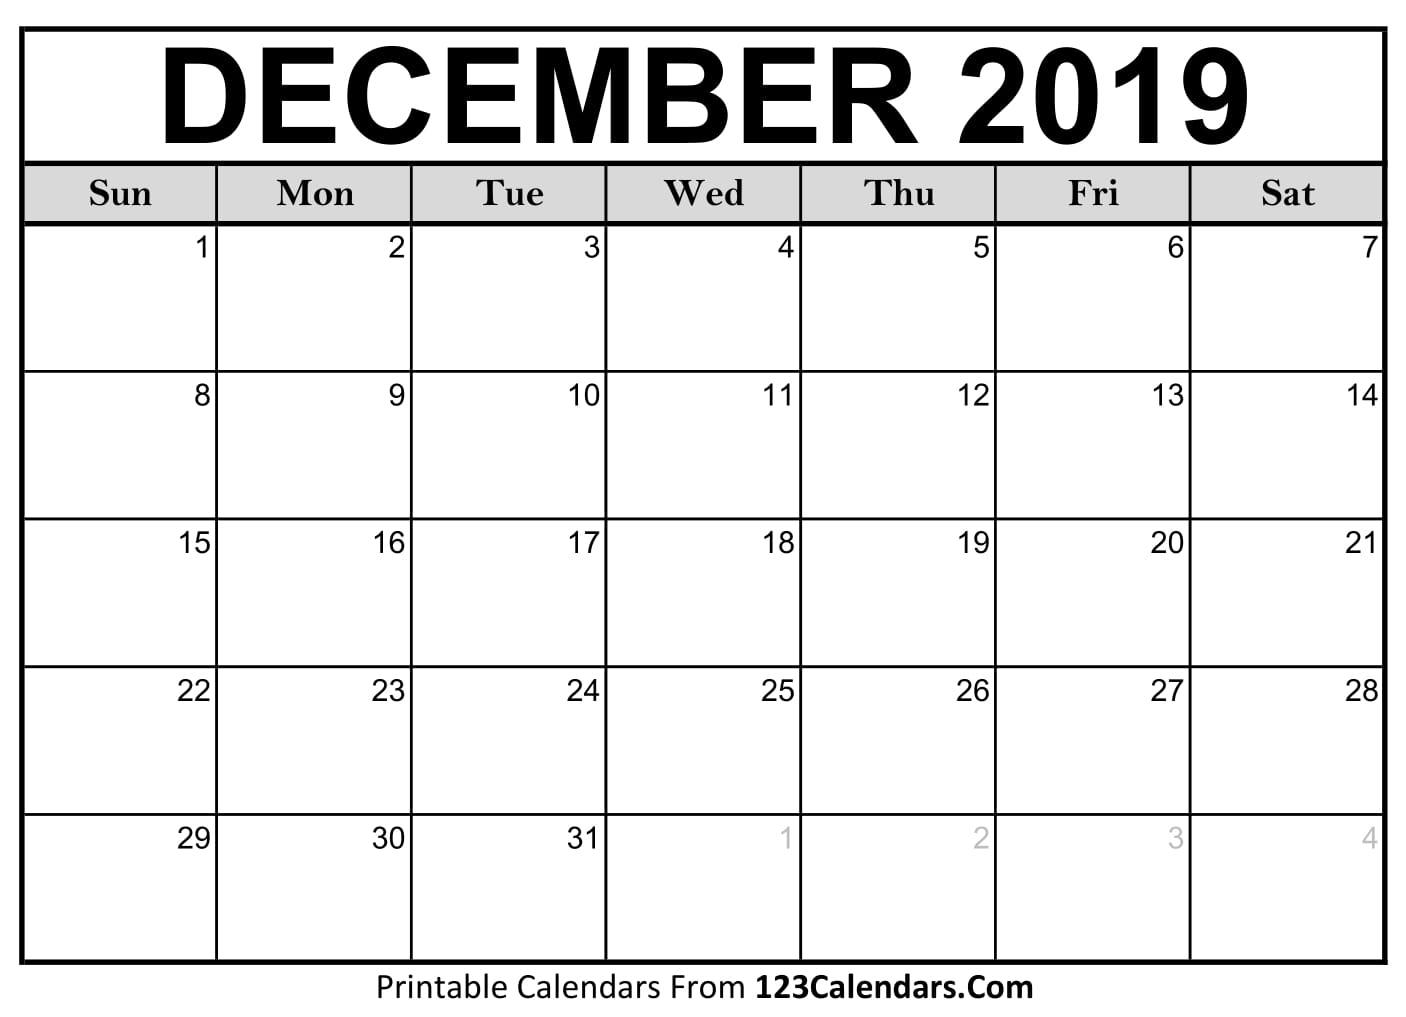 December 2019 Printable Calendar | 123Calendars within Blank Calendar For December